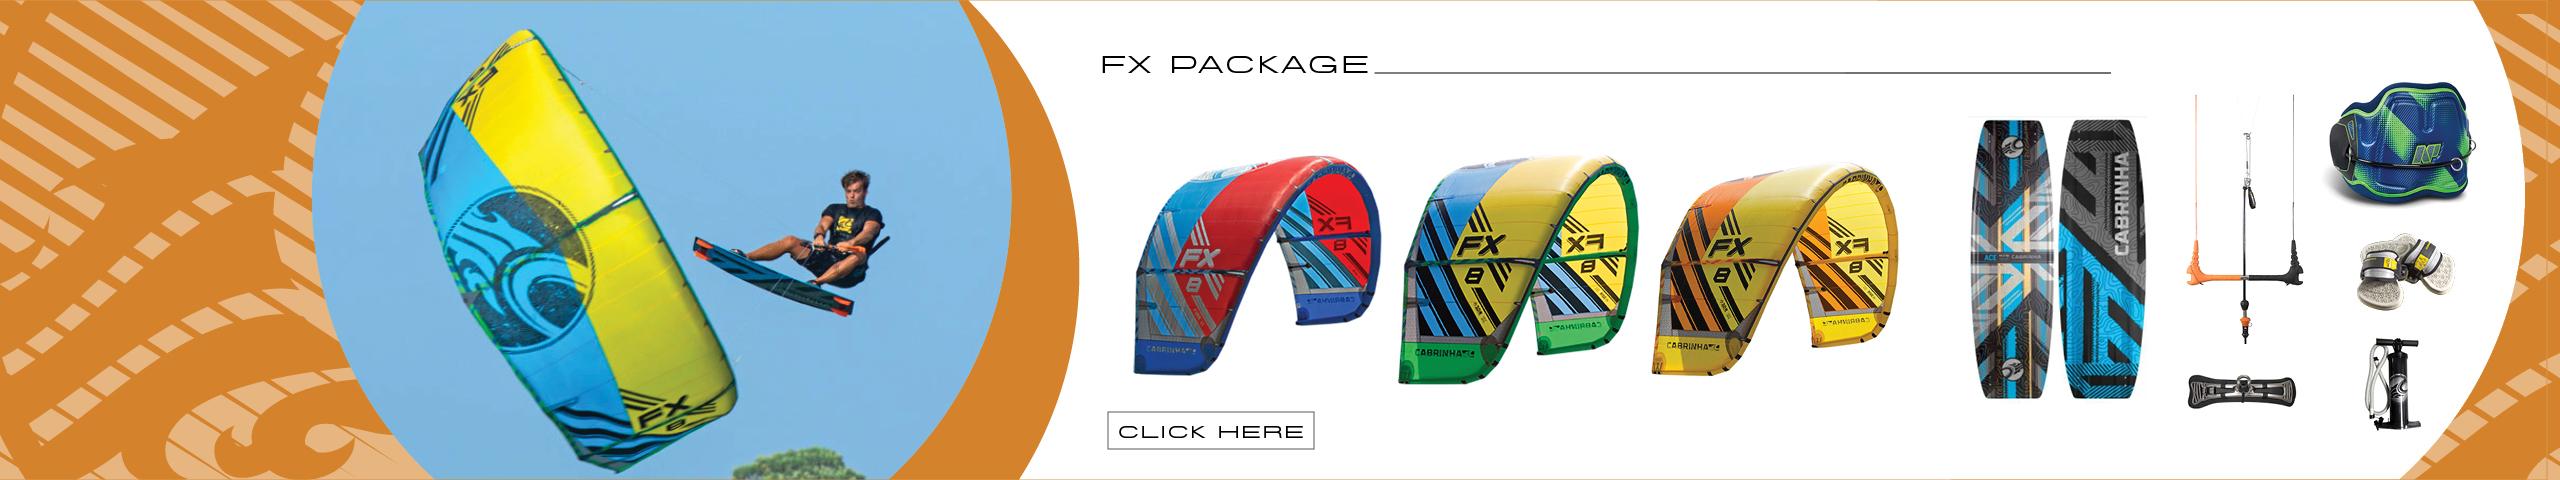 Cabrinha FX Kite Package